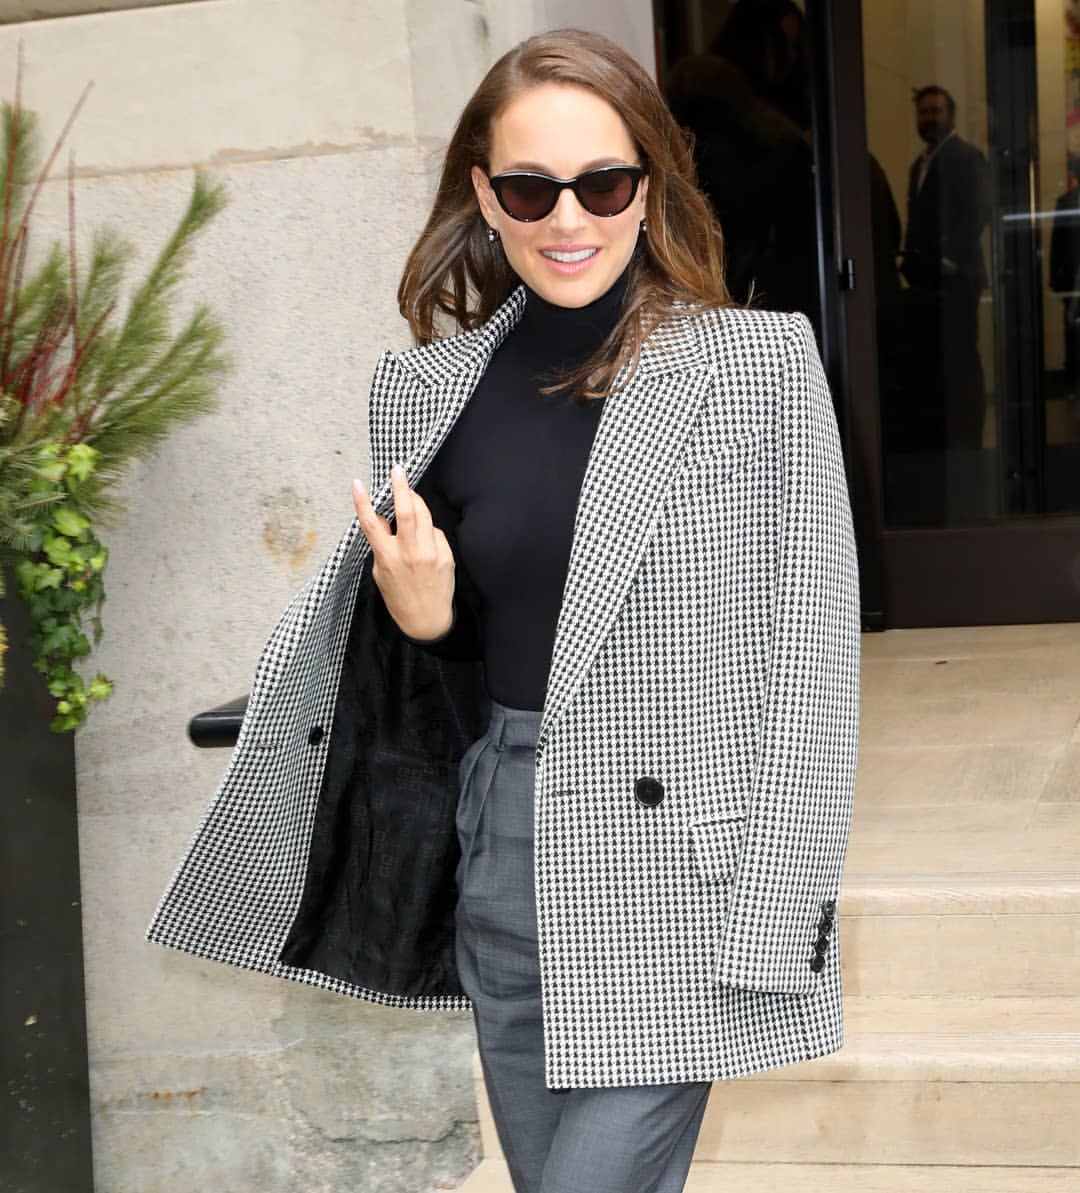 Natalie in NYC